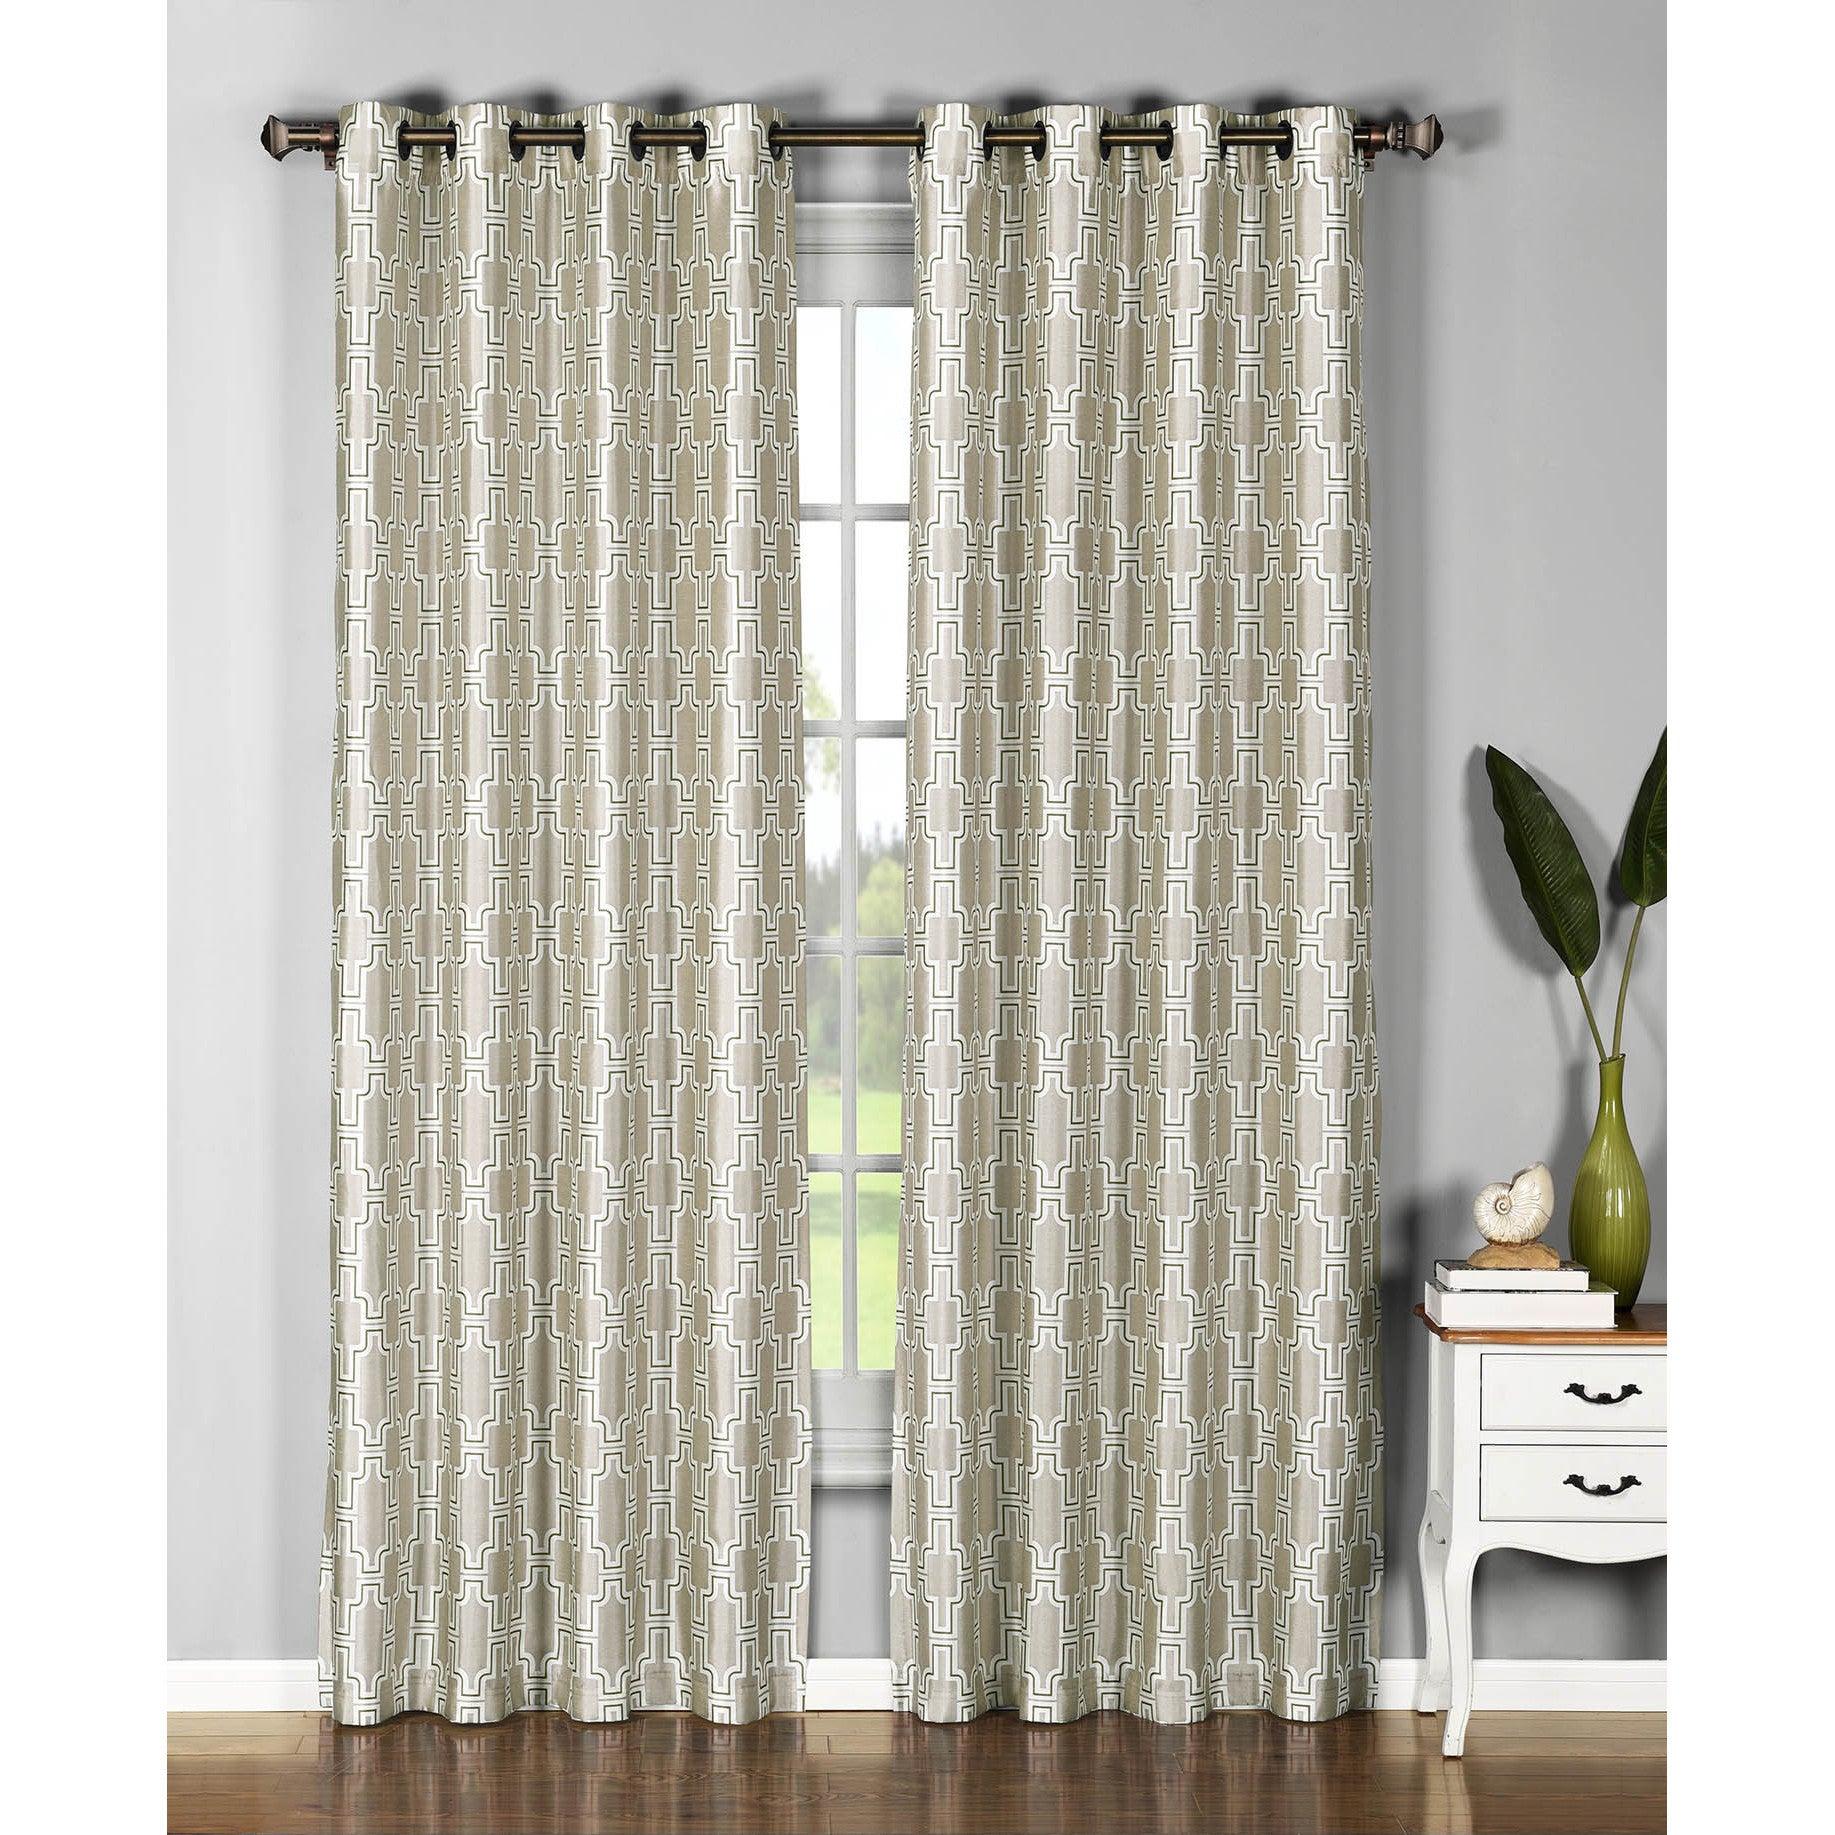 Window Elements Wesley Sheer Grommet Curtain Panel Pair - 54 X 96 inside Grommet Curtain Panels (Image 20 of 20)